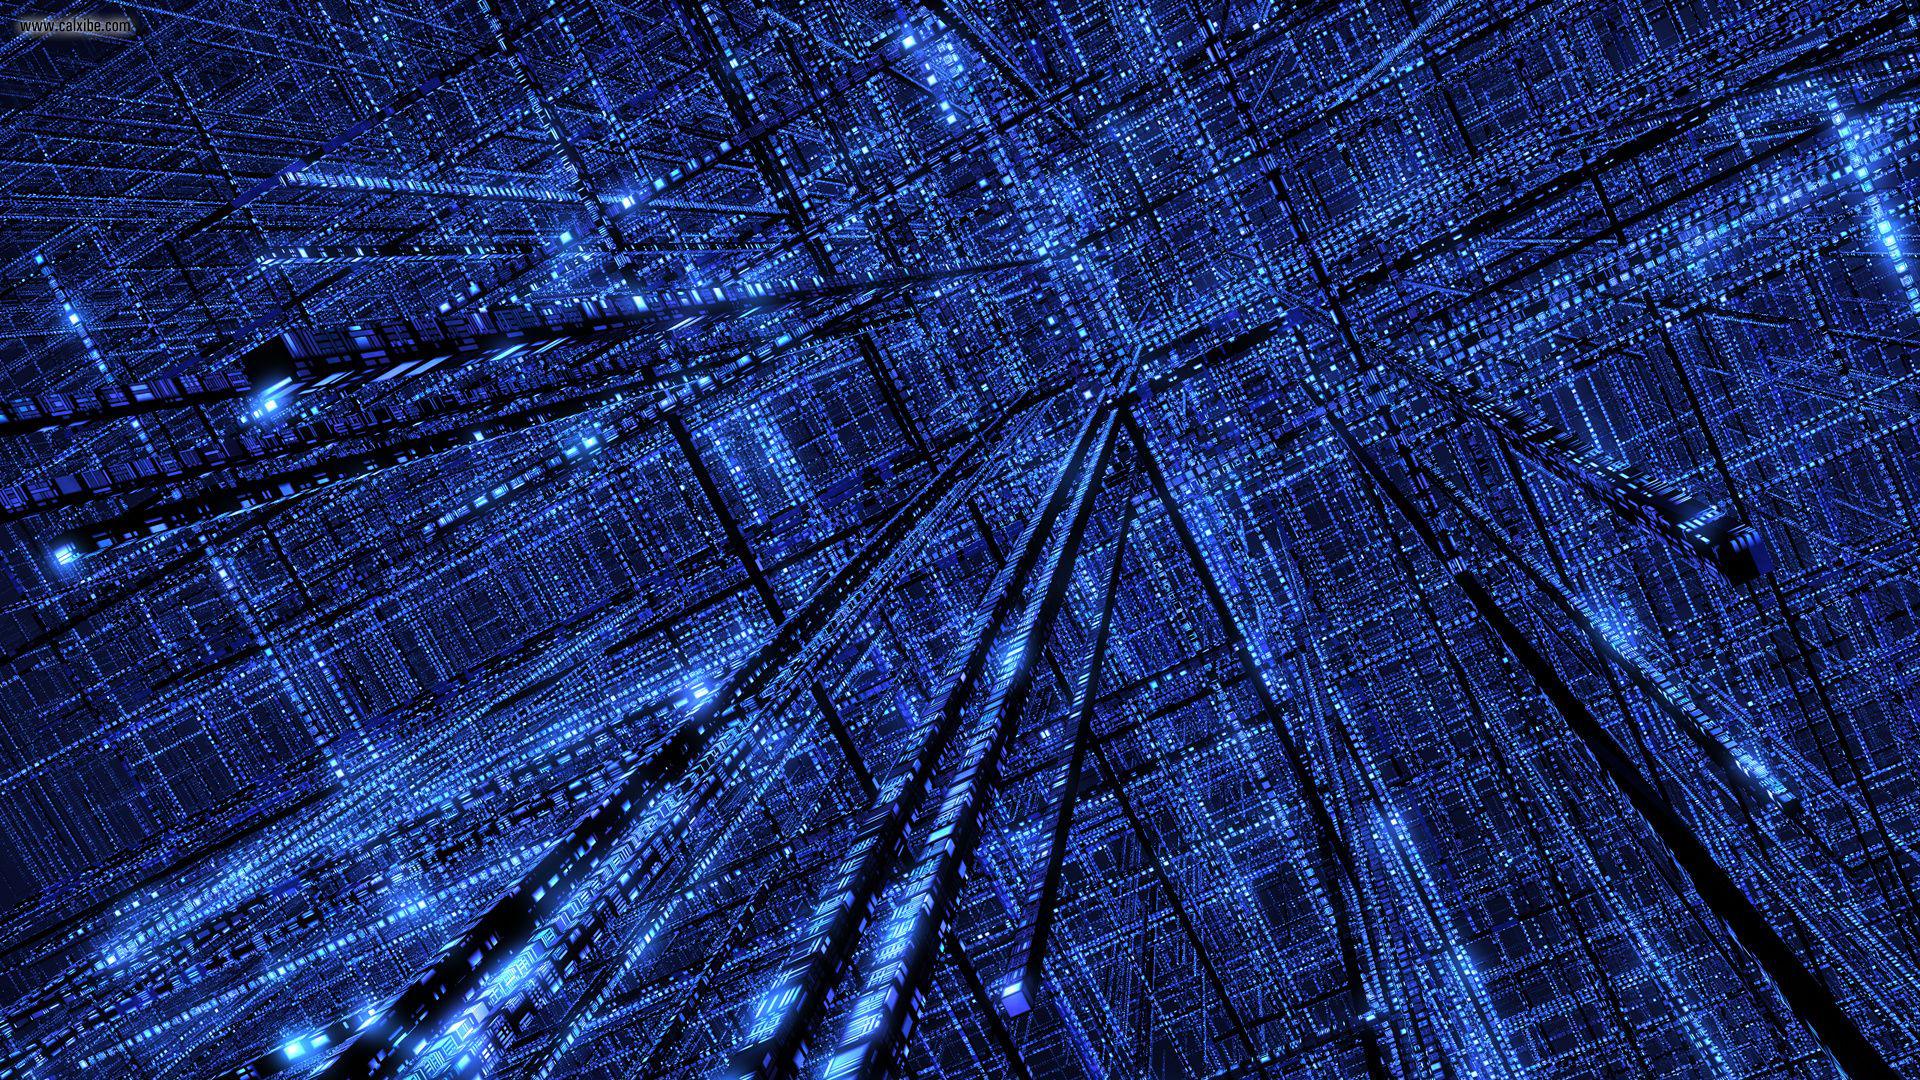 image vw2 jpg superpower wiki fandom powered by wikia